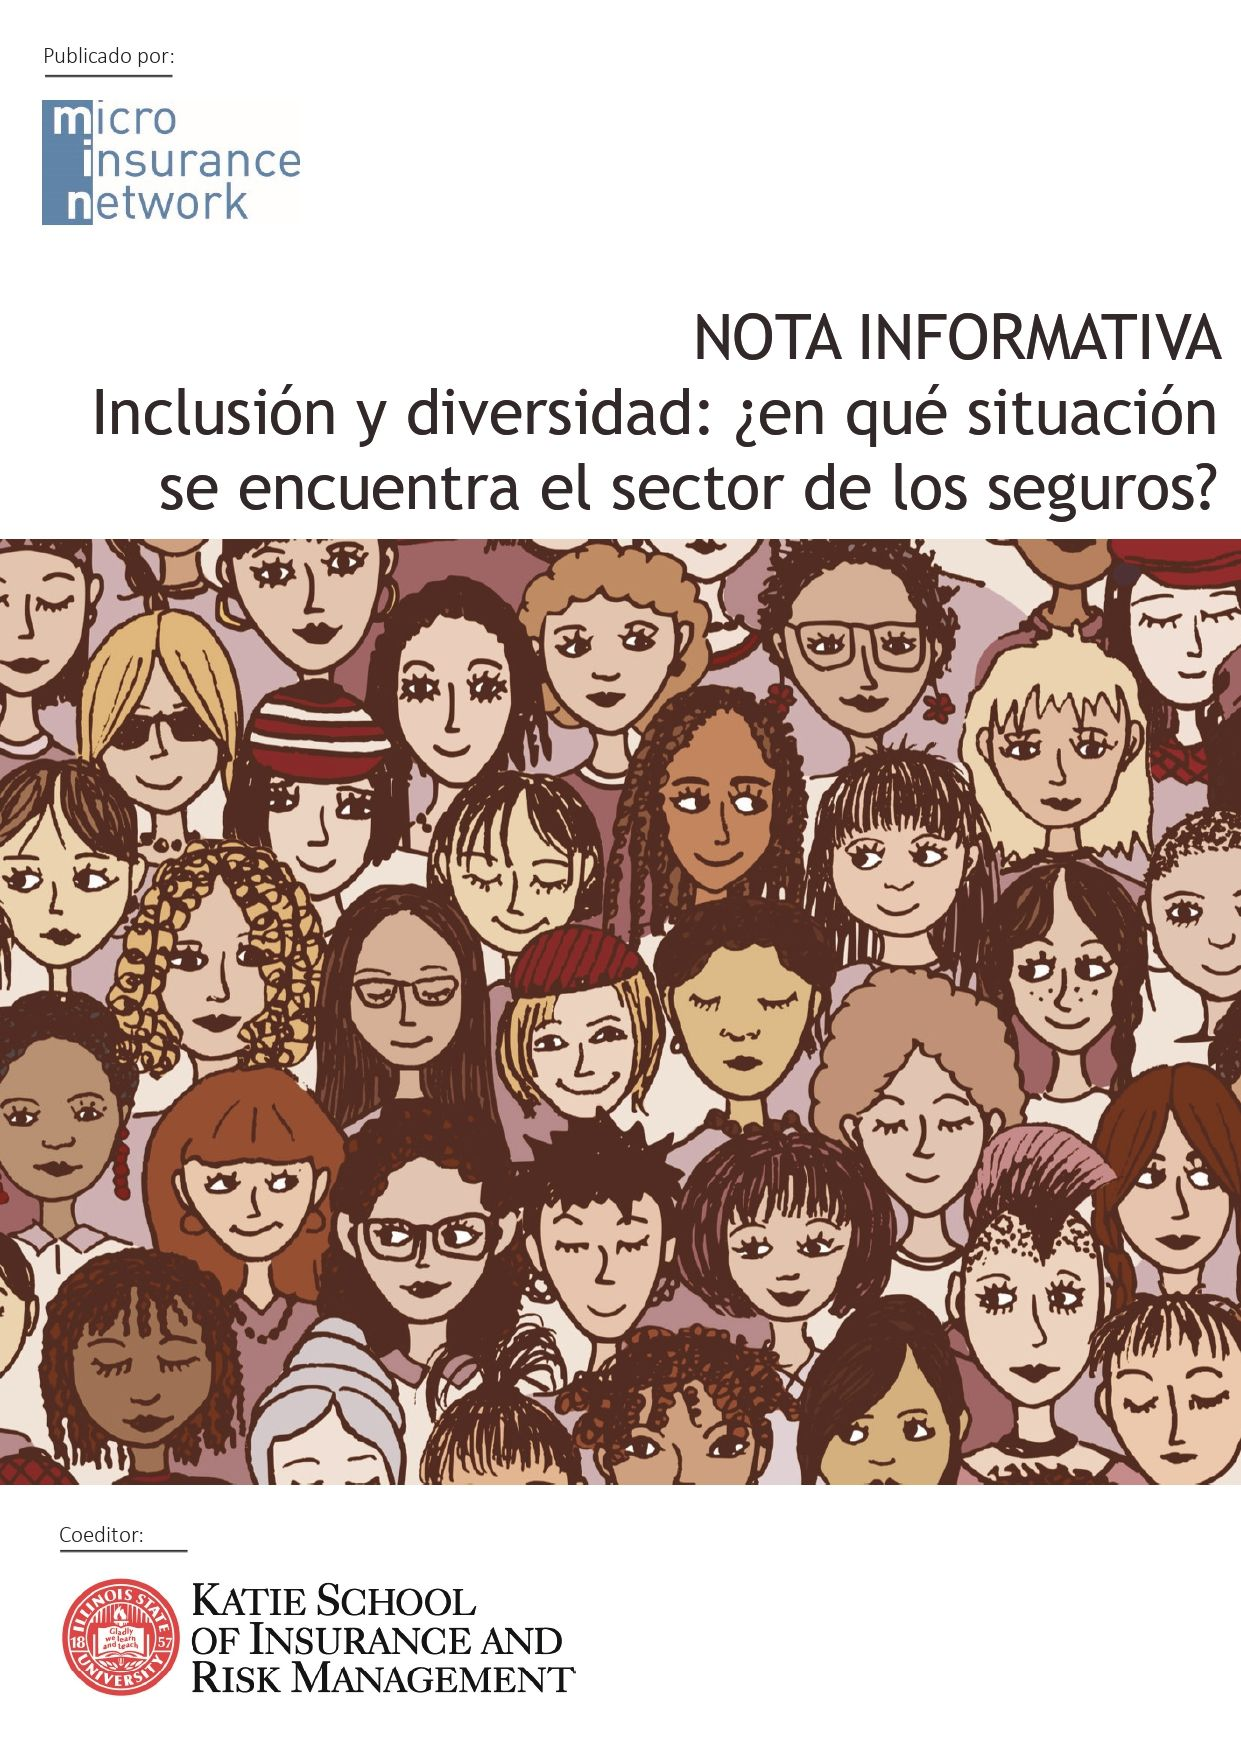 Briefing paper_Inclusion & Diversity_ES_0-1 (1)_page-0001.jpg